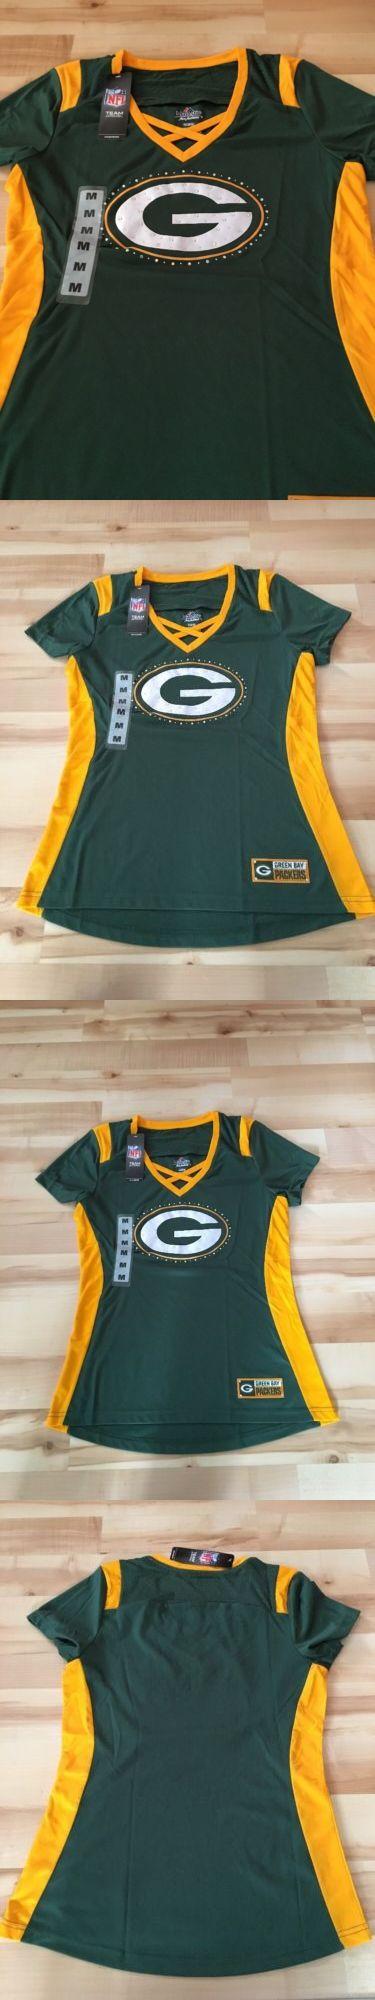 Women 159110: Women S Majestic Green Bay Packers Draft Me Tee Size Medium Nfl Rhinestones -> BUY IT NOW ONLY: $32.99 on eBay!